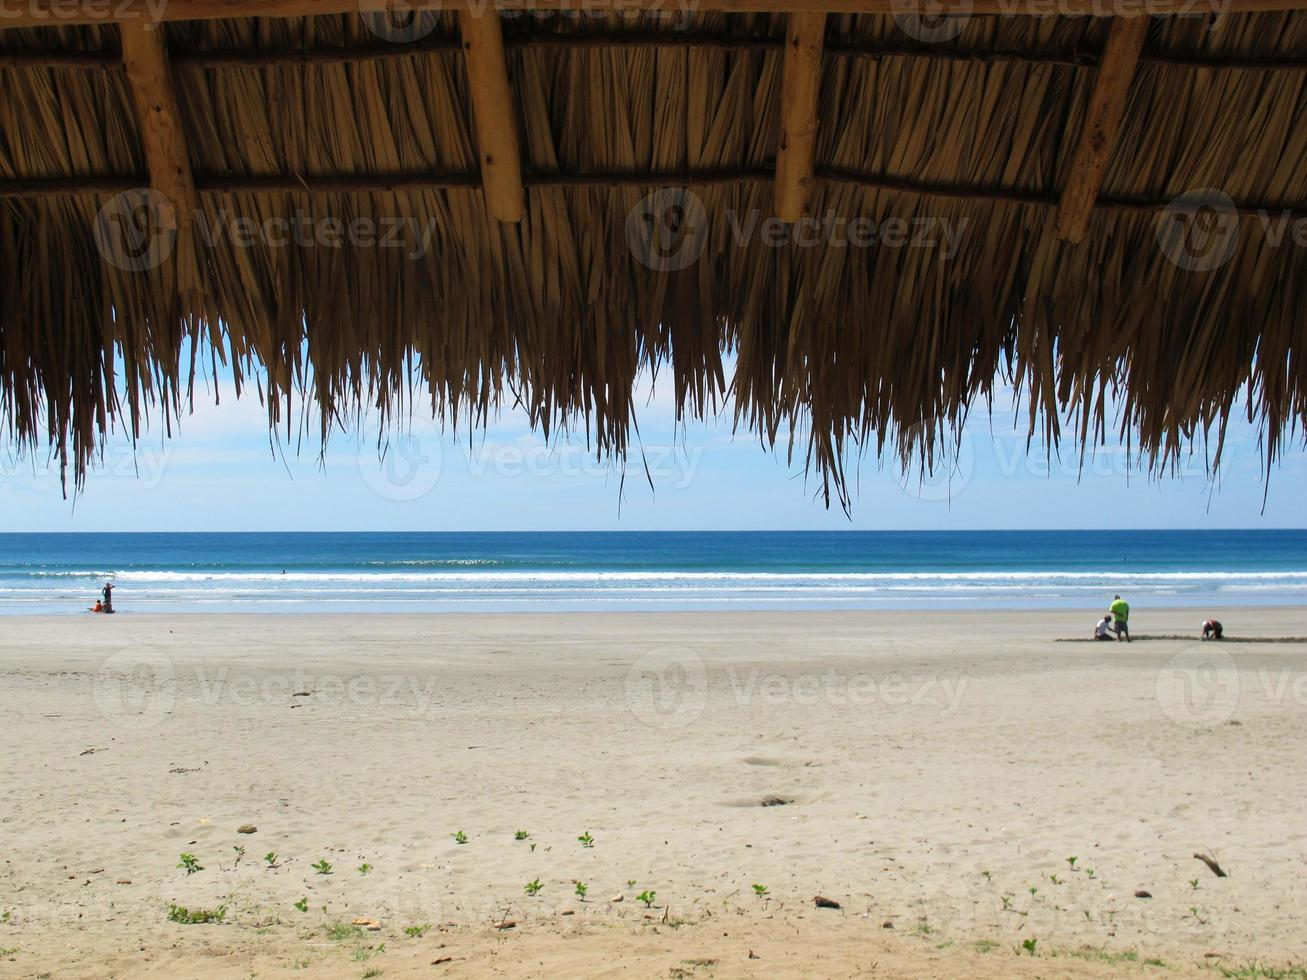 ruhiger Strand mit Palmblatt Cabana. foto